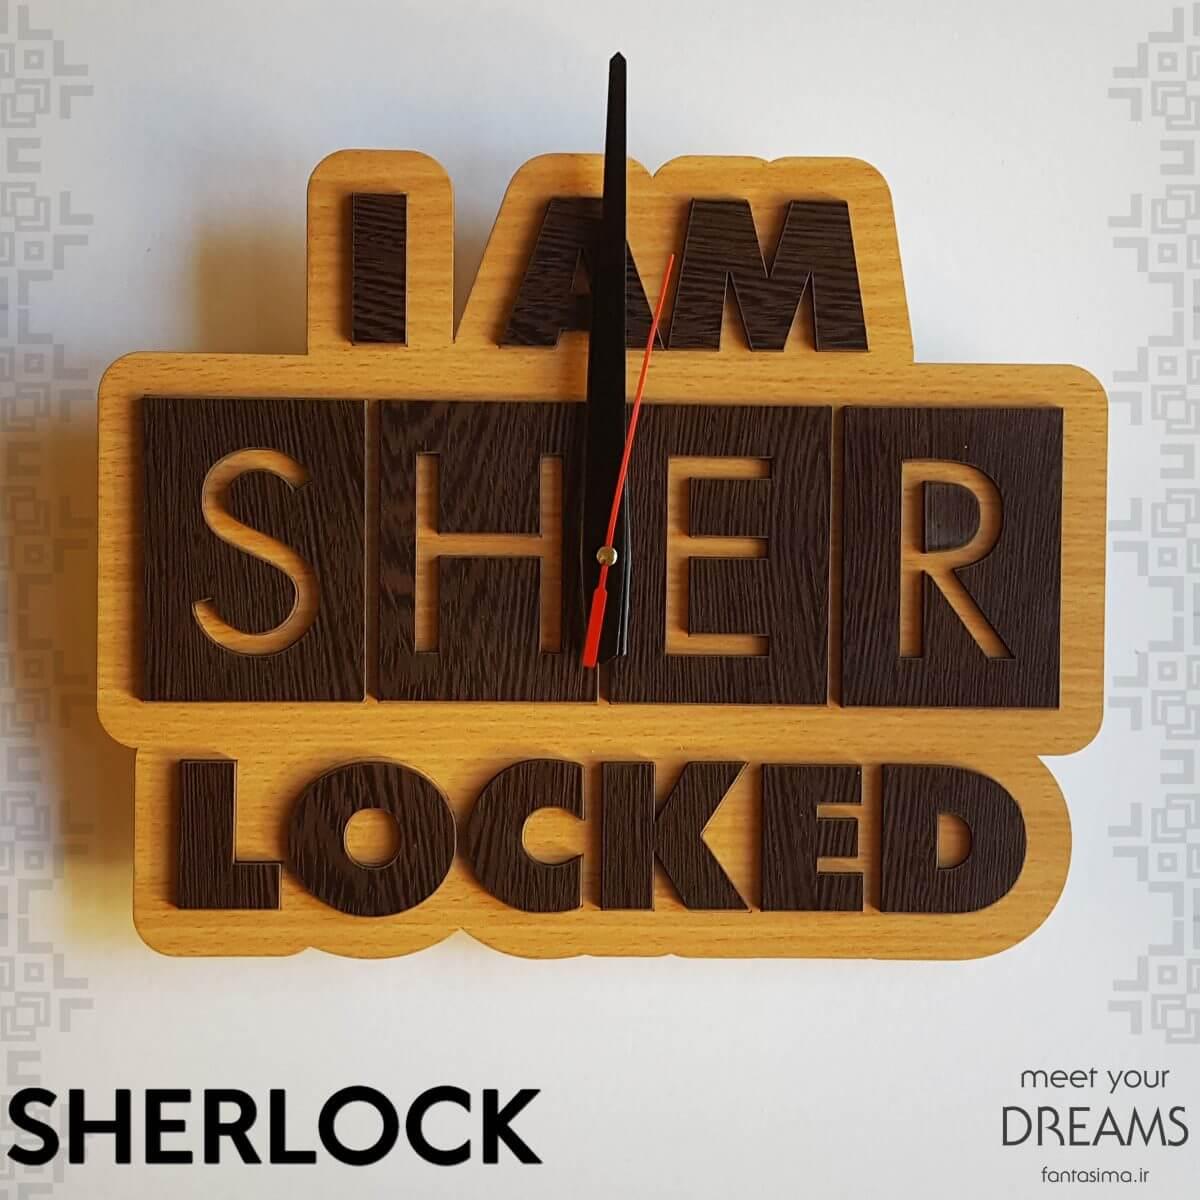 فانتزیآرت ساعت I AM SHERLOCKED